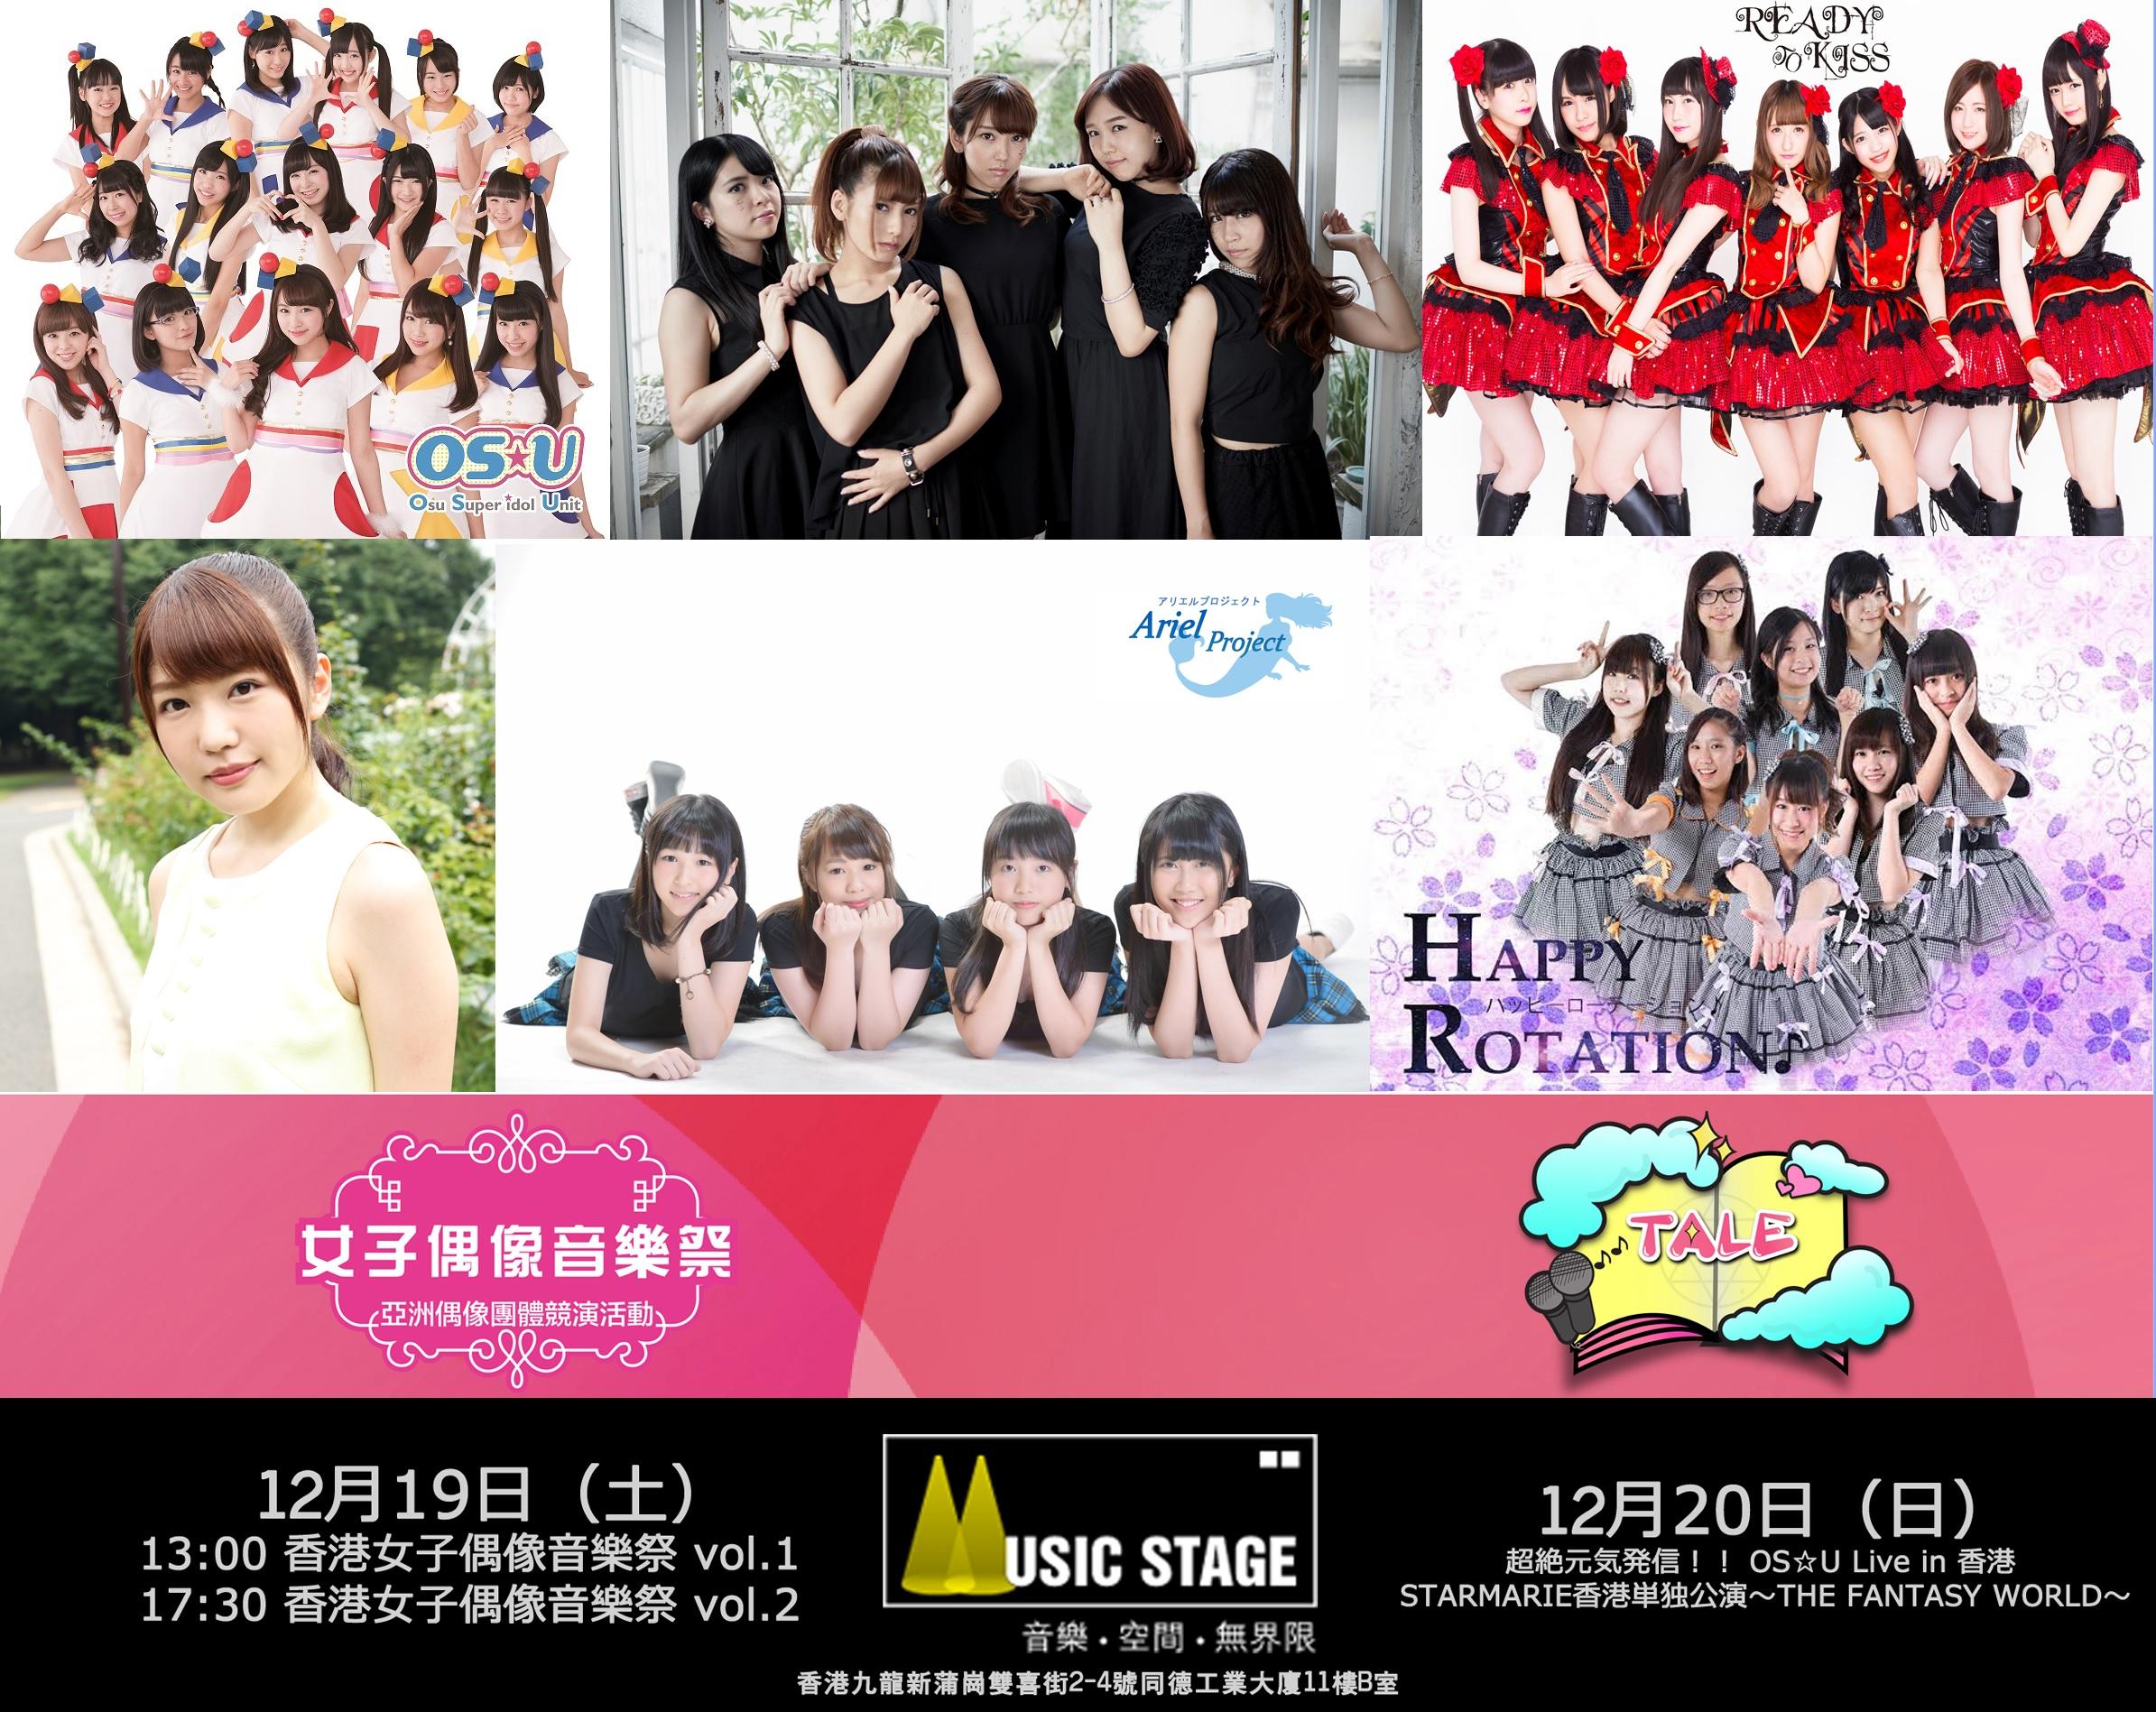 香港女子偶像音樂祭 supported by TALE